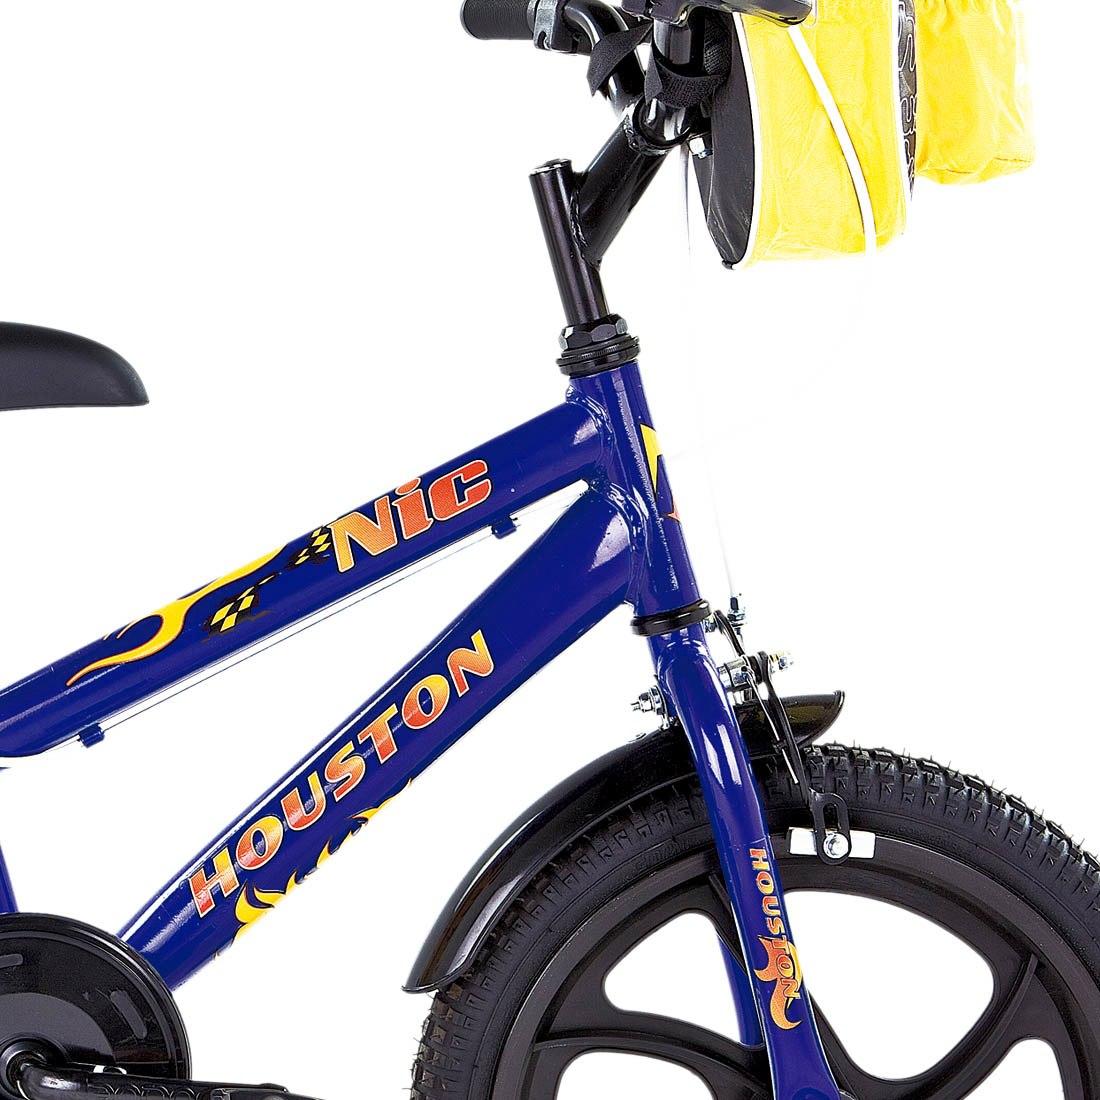 3b18375da Carregando zoom... aro houston bicicleta. Carregando zoom... bicicleta aro  16 houston nic azul com bolsa e capacete